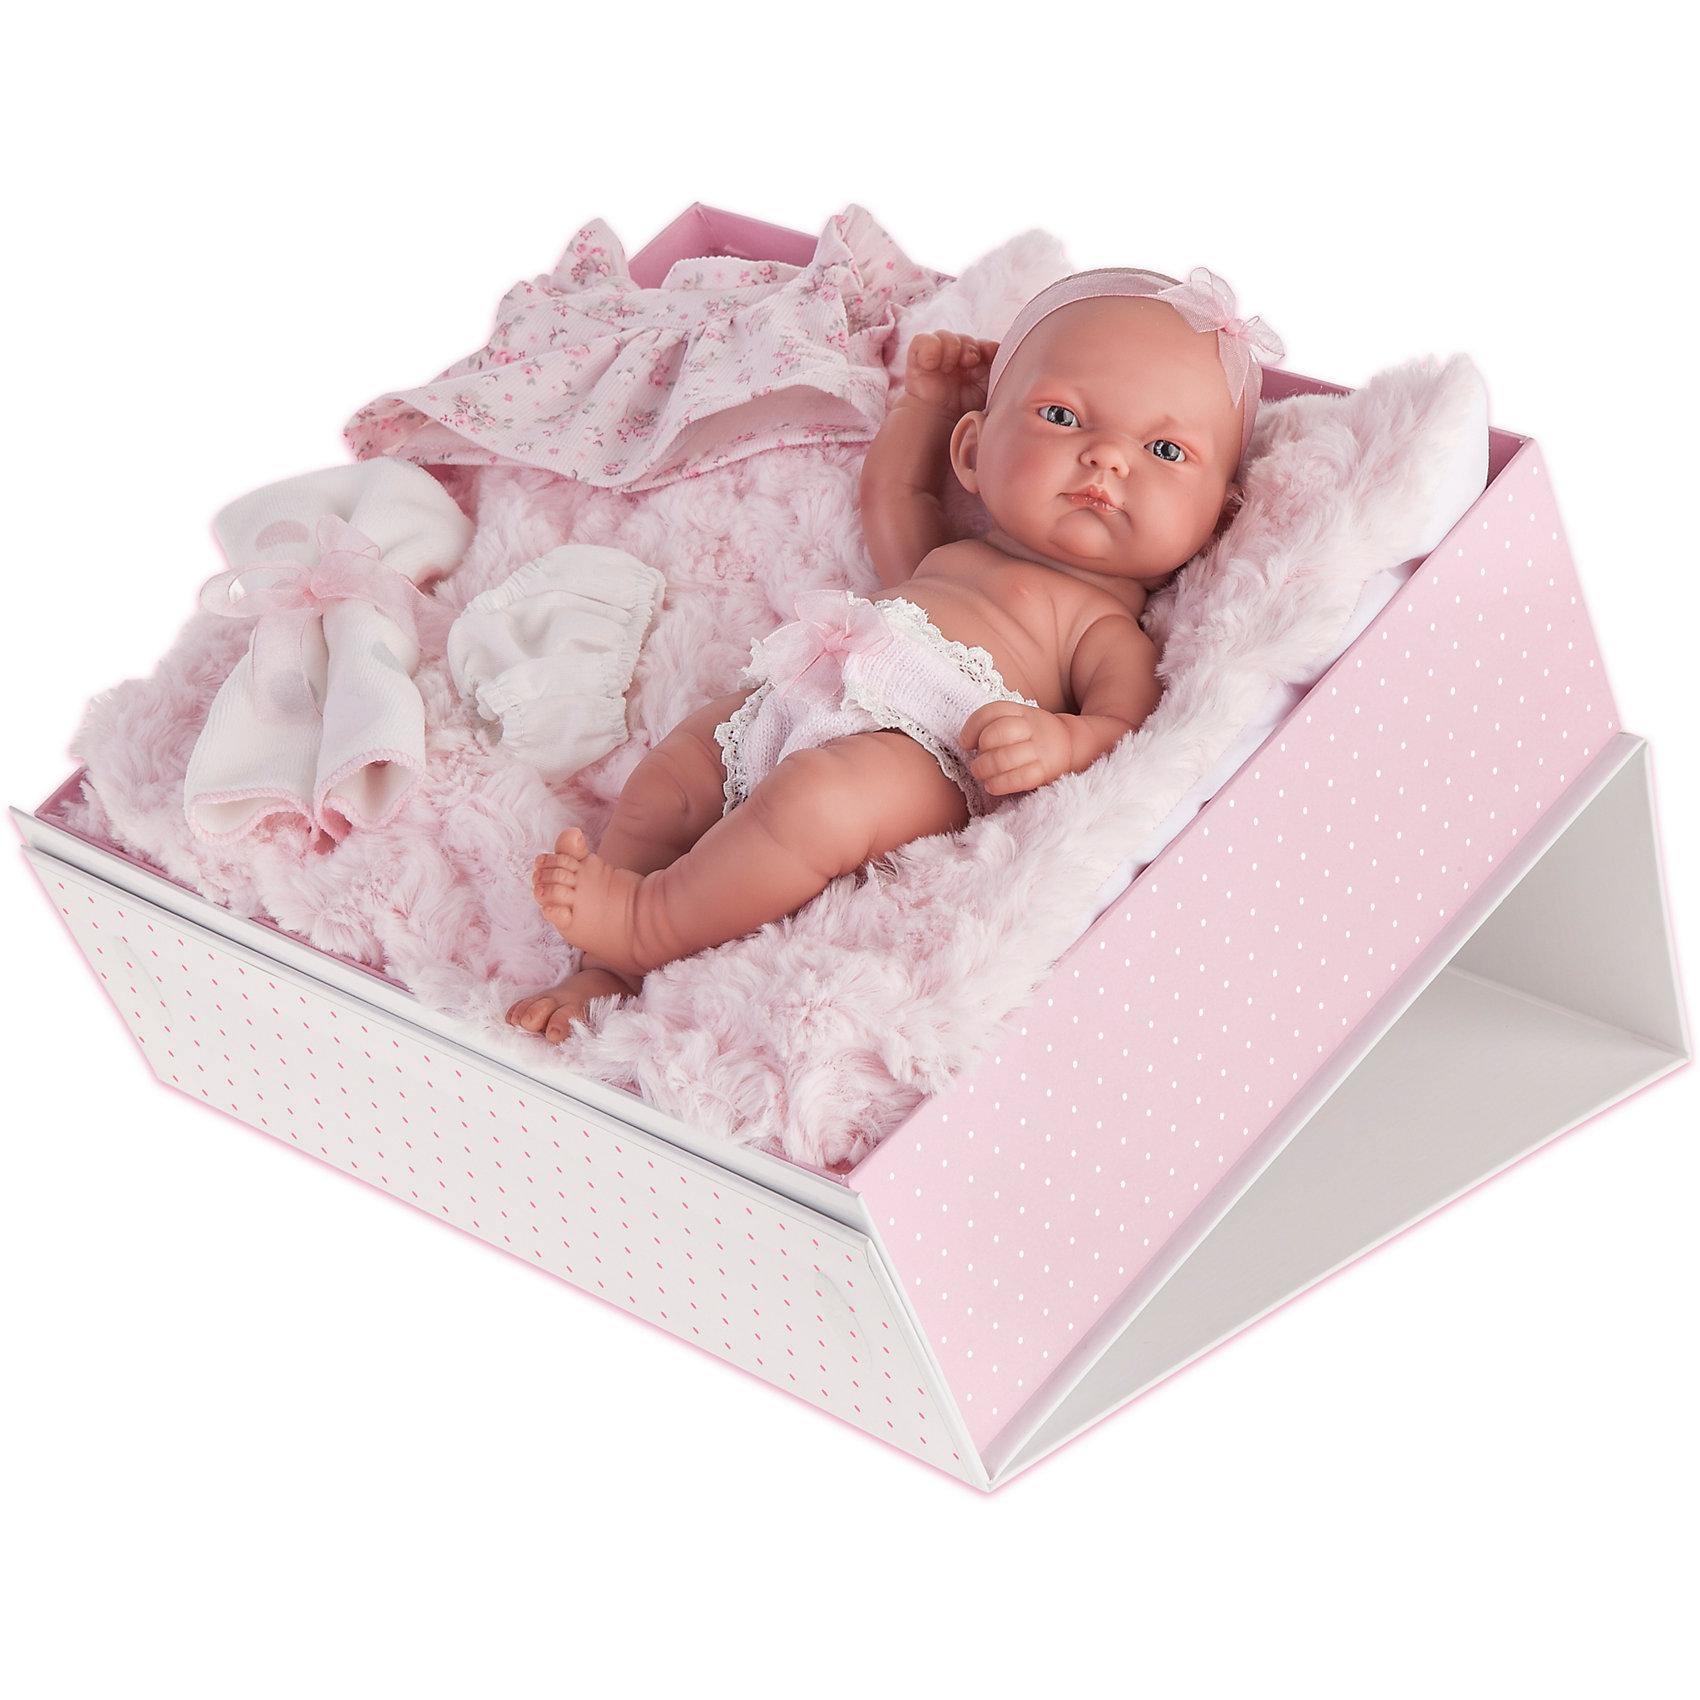 Munecas Antonio Juan Кукла-младенец Карла в чемодане, розовый, 26 см, Munecas Antonio Juan munecas antonio juan кукла младенец карлос в конверте голубой 26 см munecas antonio juan